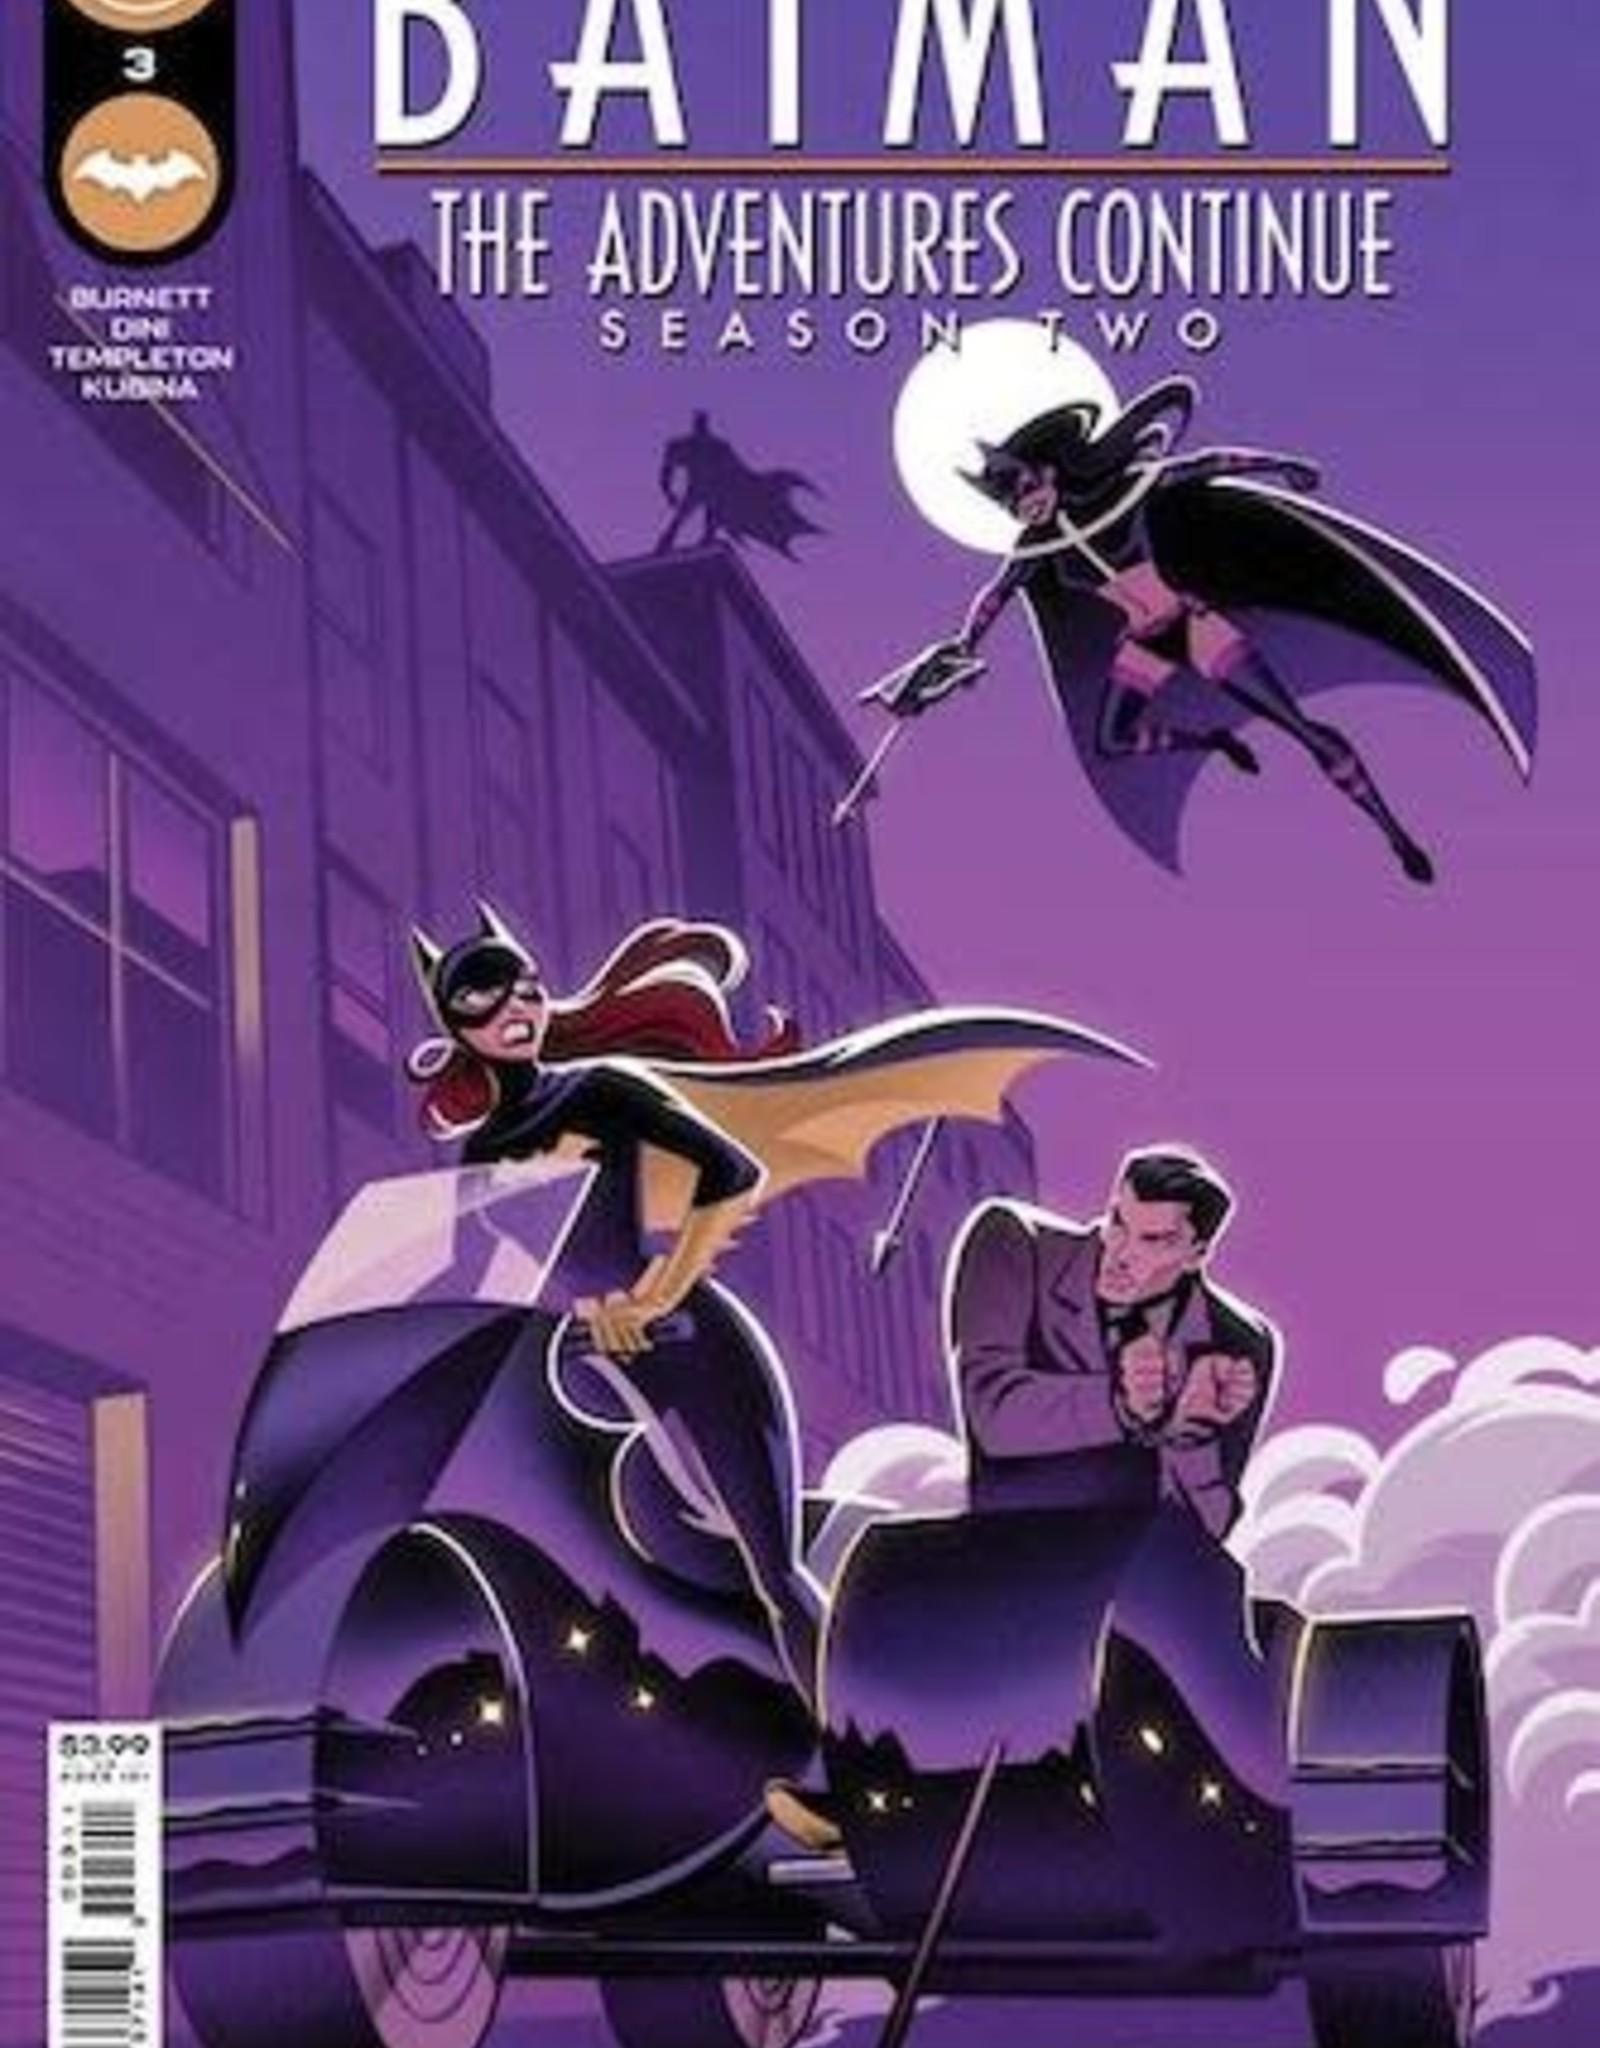 DC Comics Batman The Adventures Continue Season II #3 Cvr A Stephanie Pepper